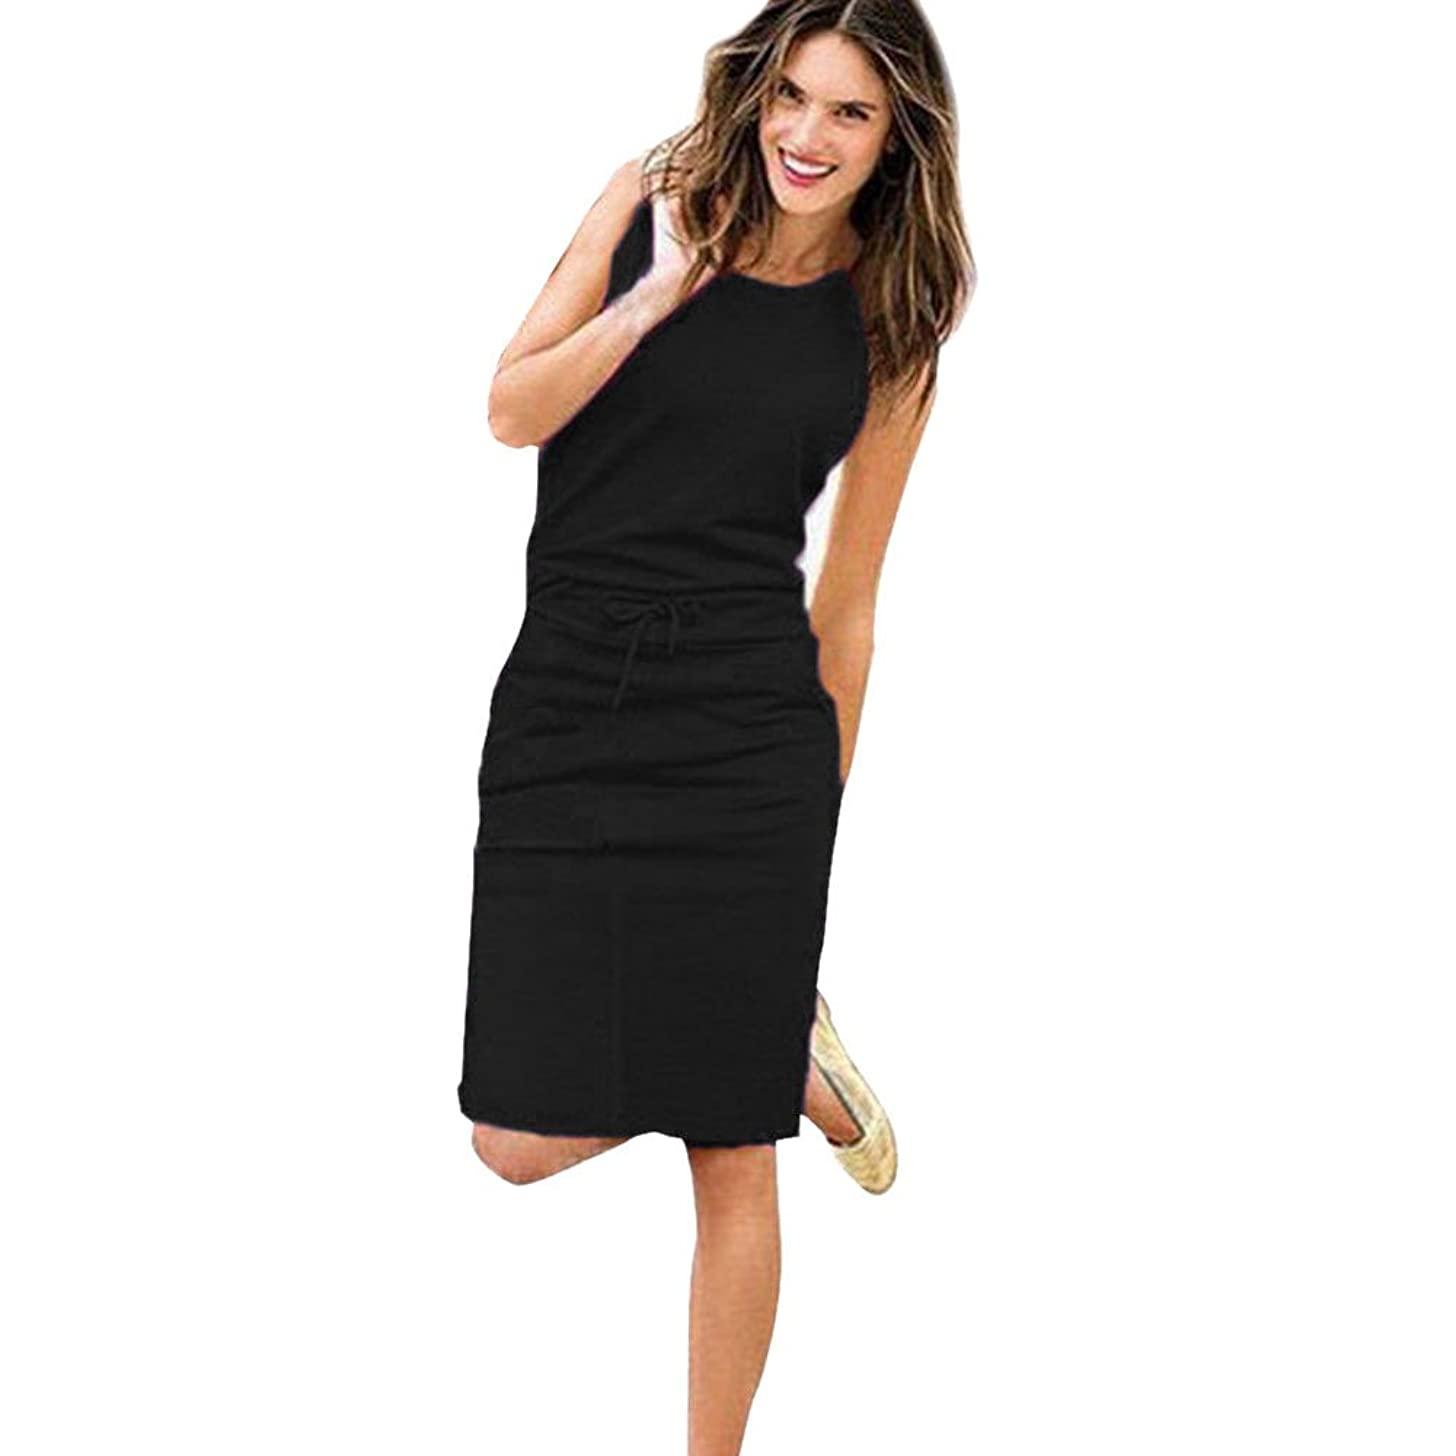 Women's Casual Solid Bodycon Round Neck Sleeveless Drawstring Waist Knee Length Midi Dress